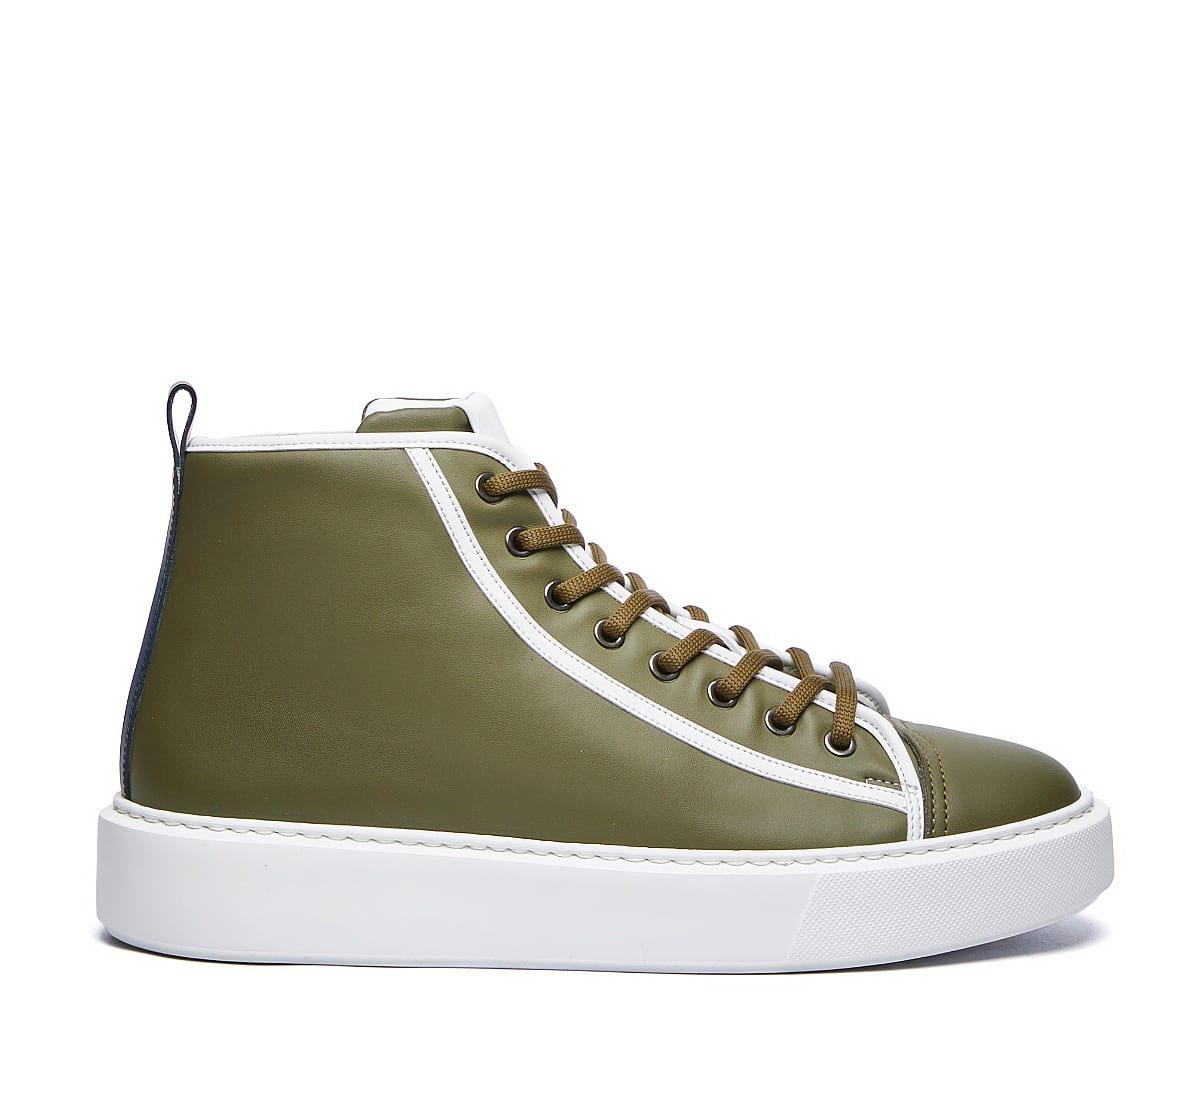 Barracuda Basket Sneaker In Verde Militare/bianco